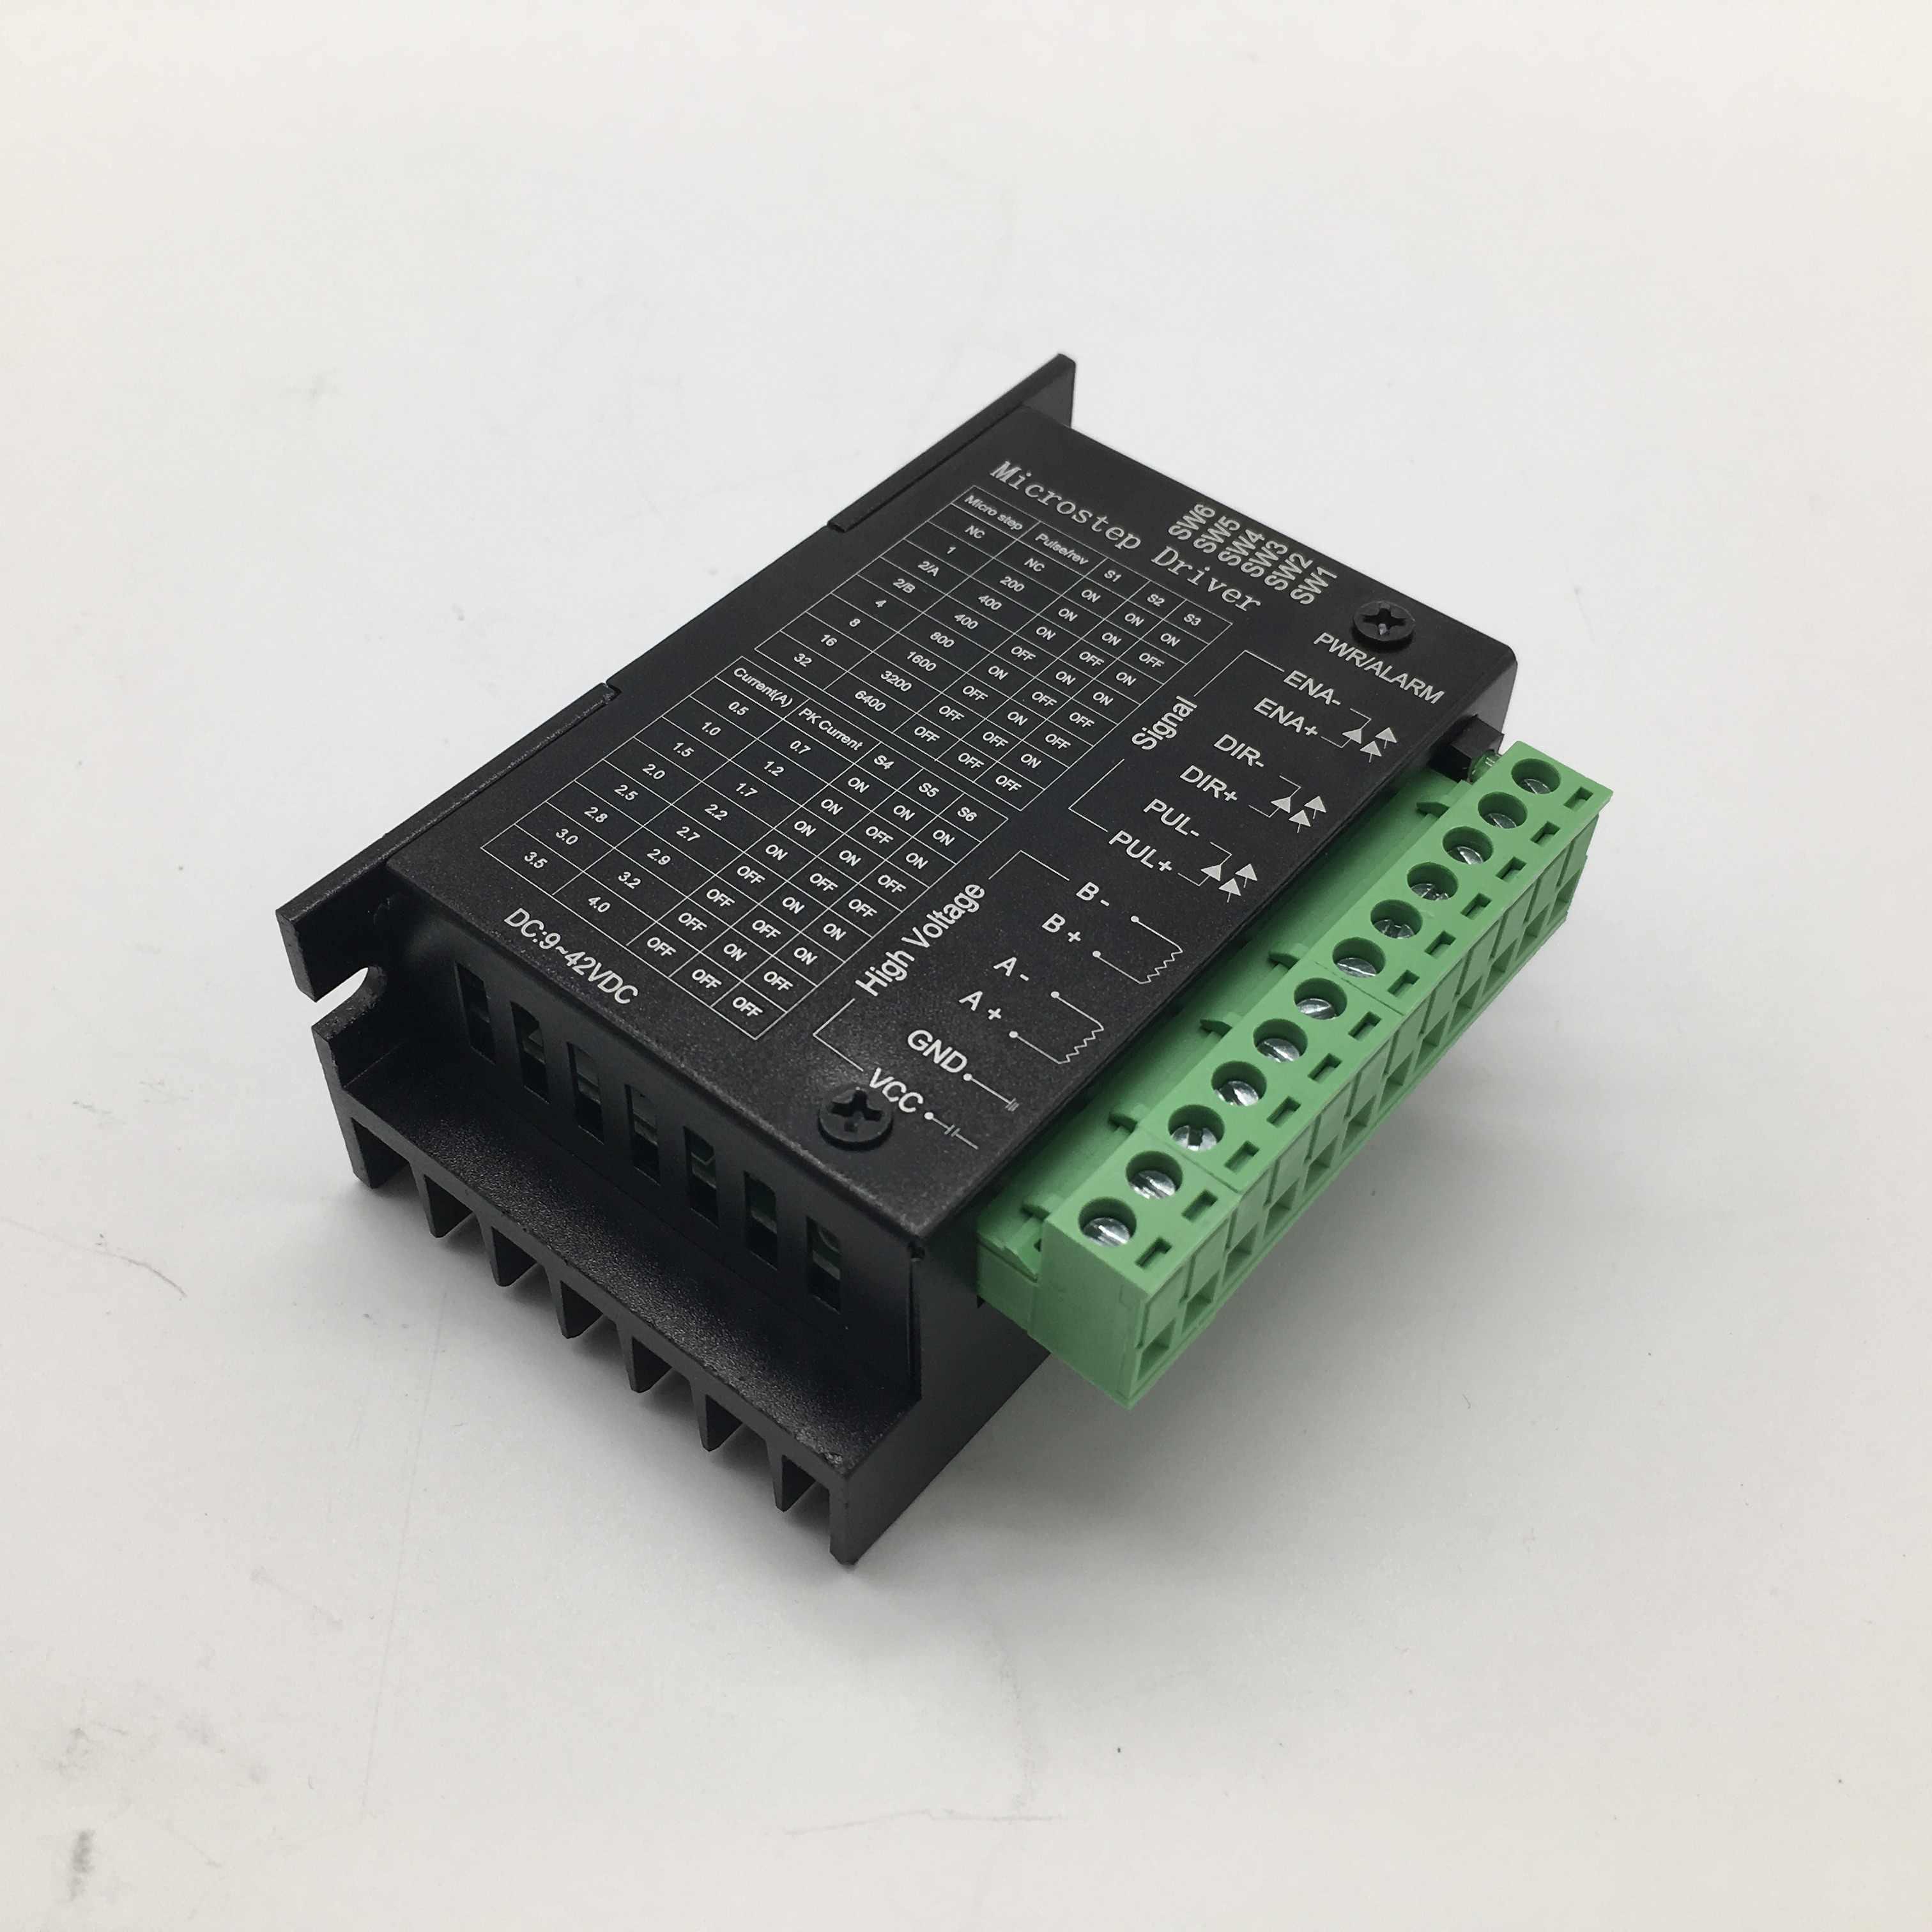 50/100/150/200 MM שבץ T-סוג הזזה שולחן רכבת ליניארי שלב תחבורה מדריך + NEMA11 28MM מנוע צעד + TB6600 נהג